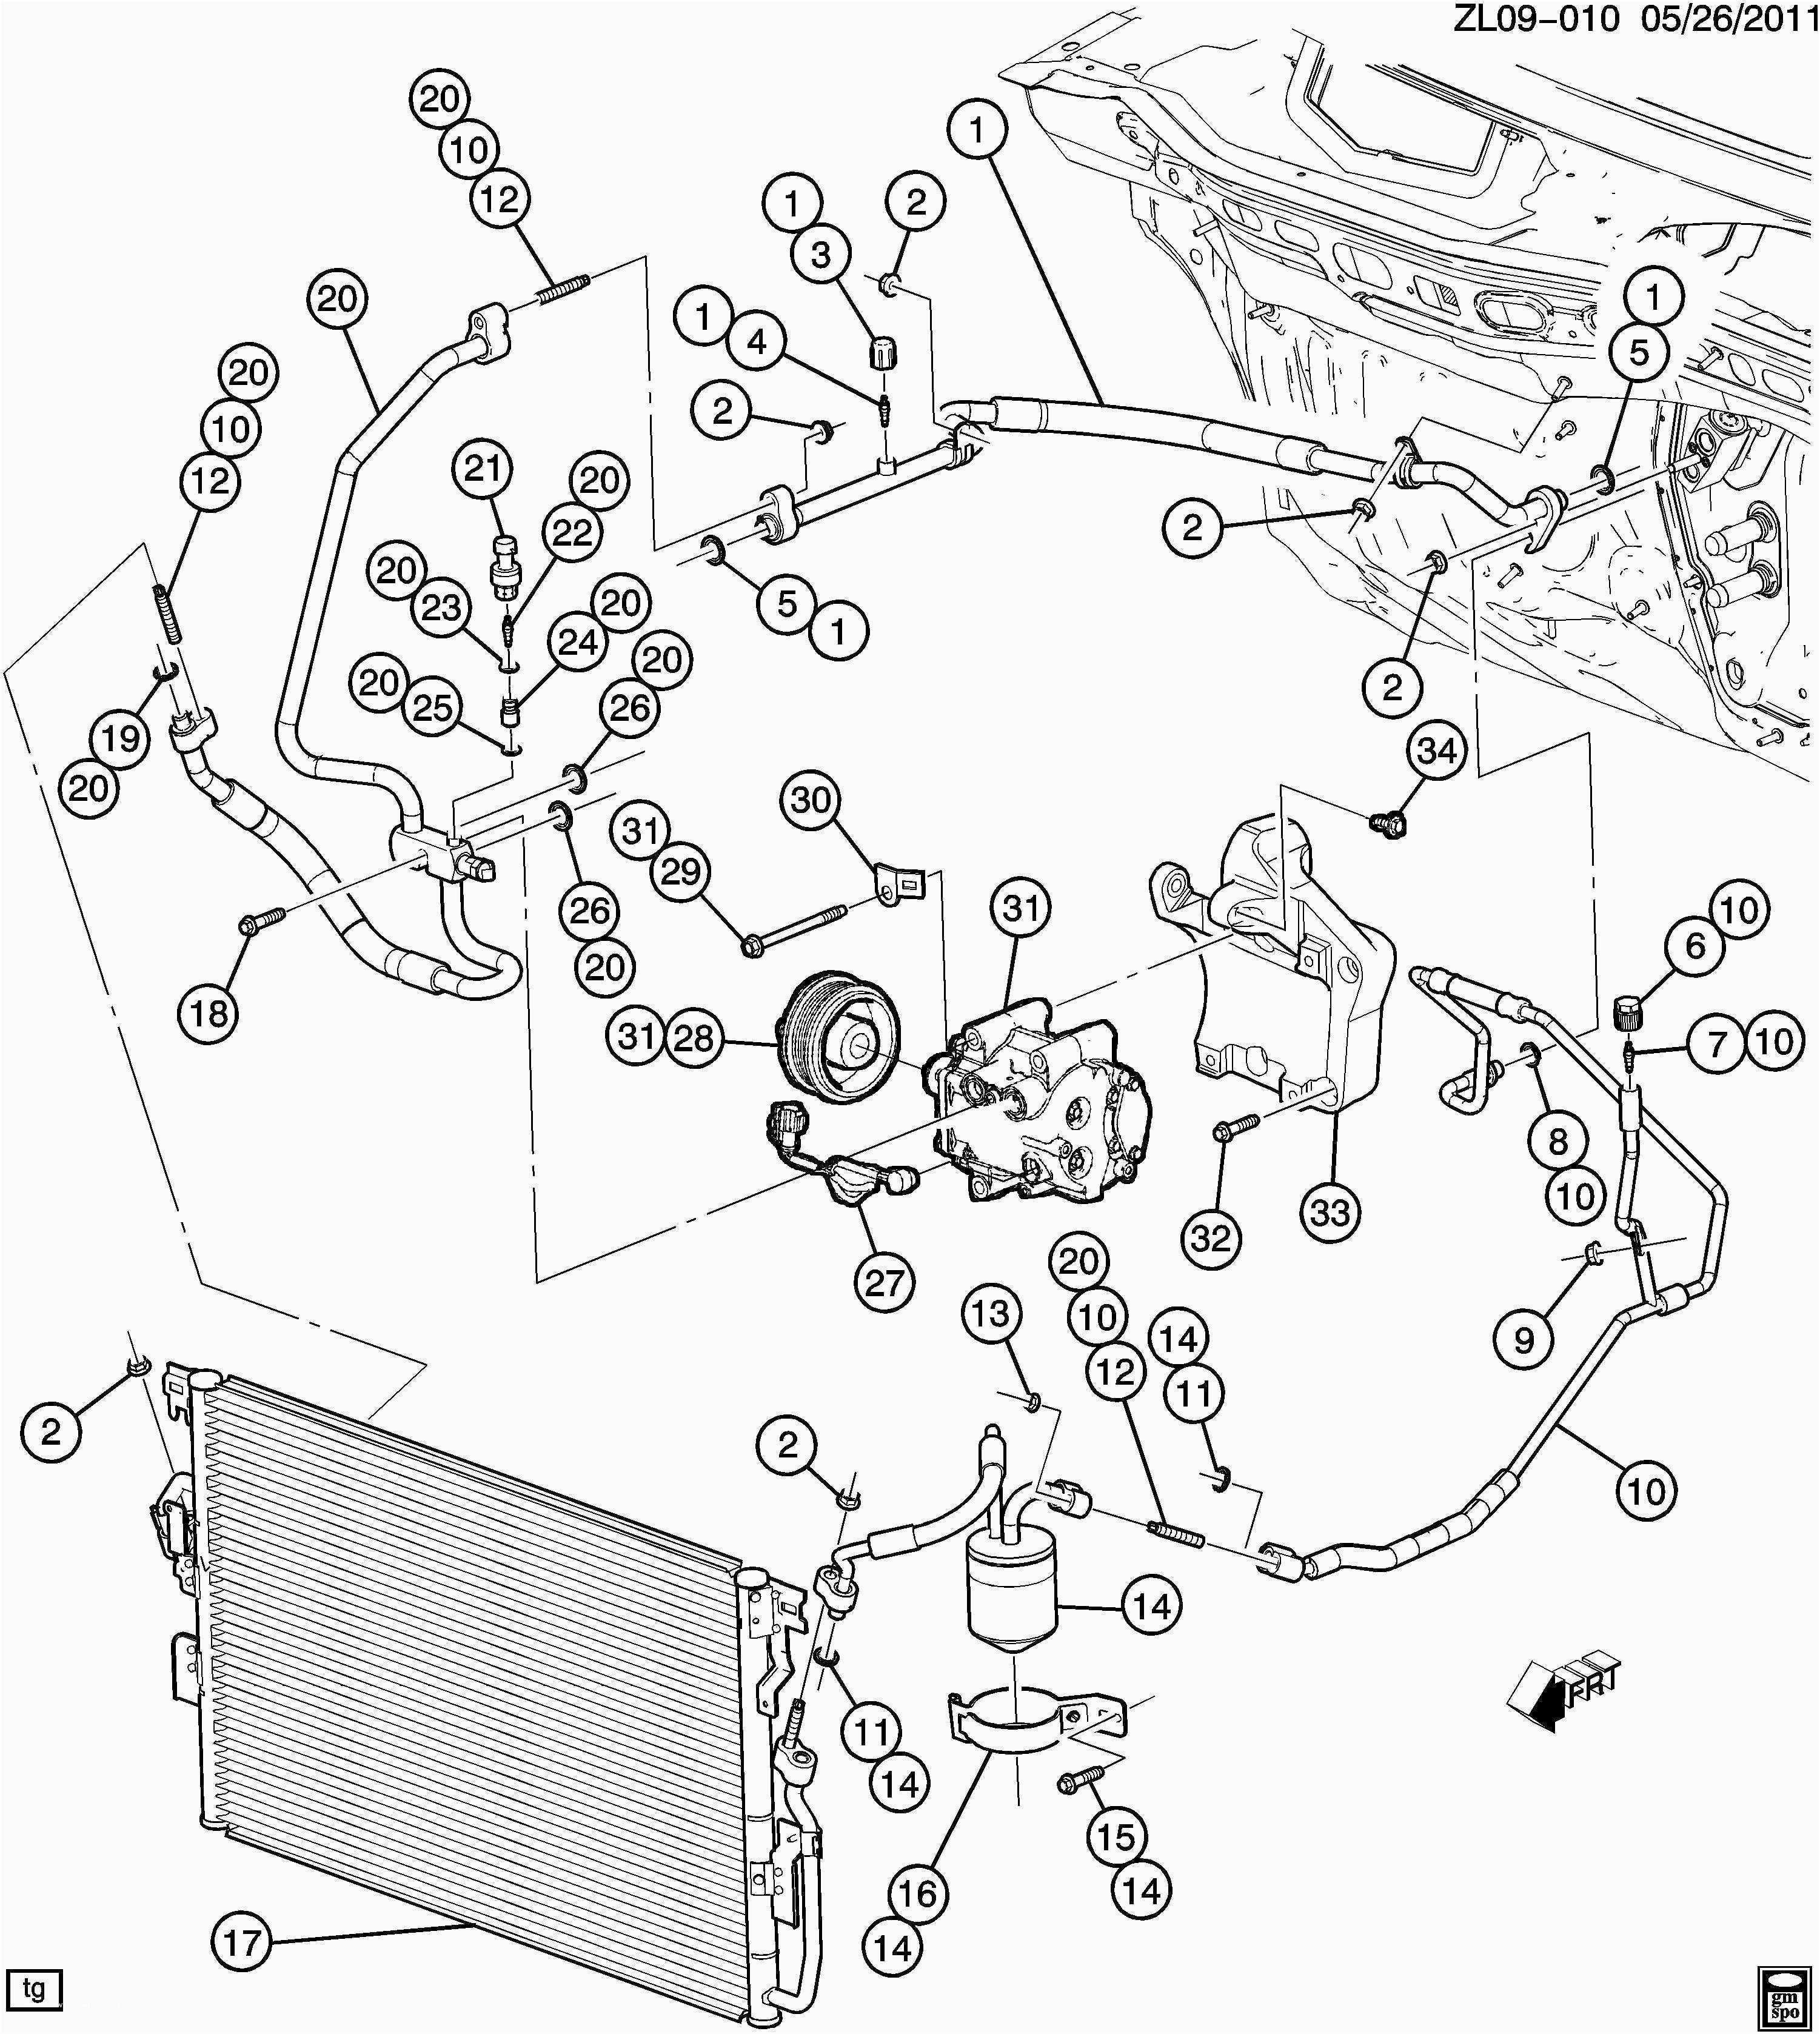 2001 Saturn Sl2 Engine Diagram 2002 Saturn L200 Engine Diagram Wiring Diagram toolbox Of 2001 Saturn Sl2 Engine Diagram